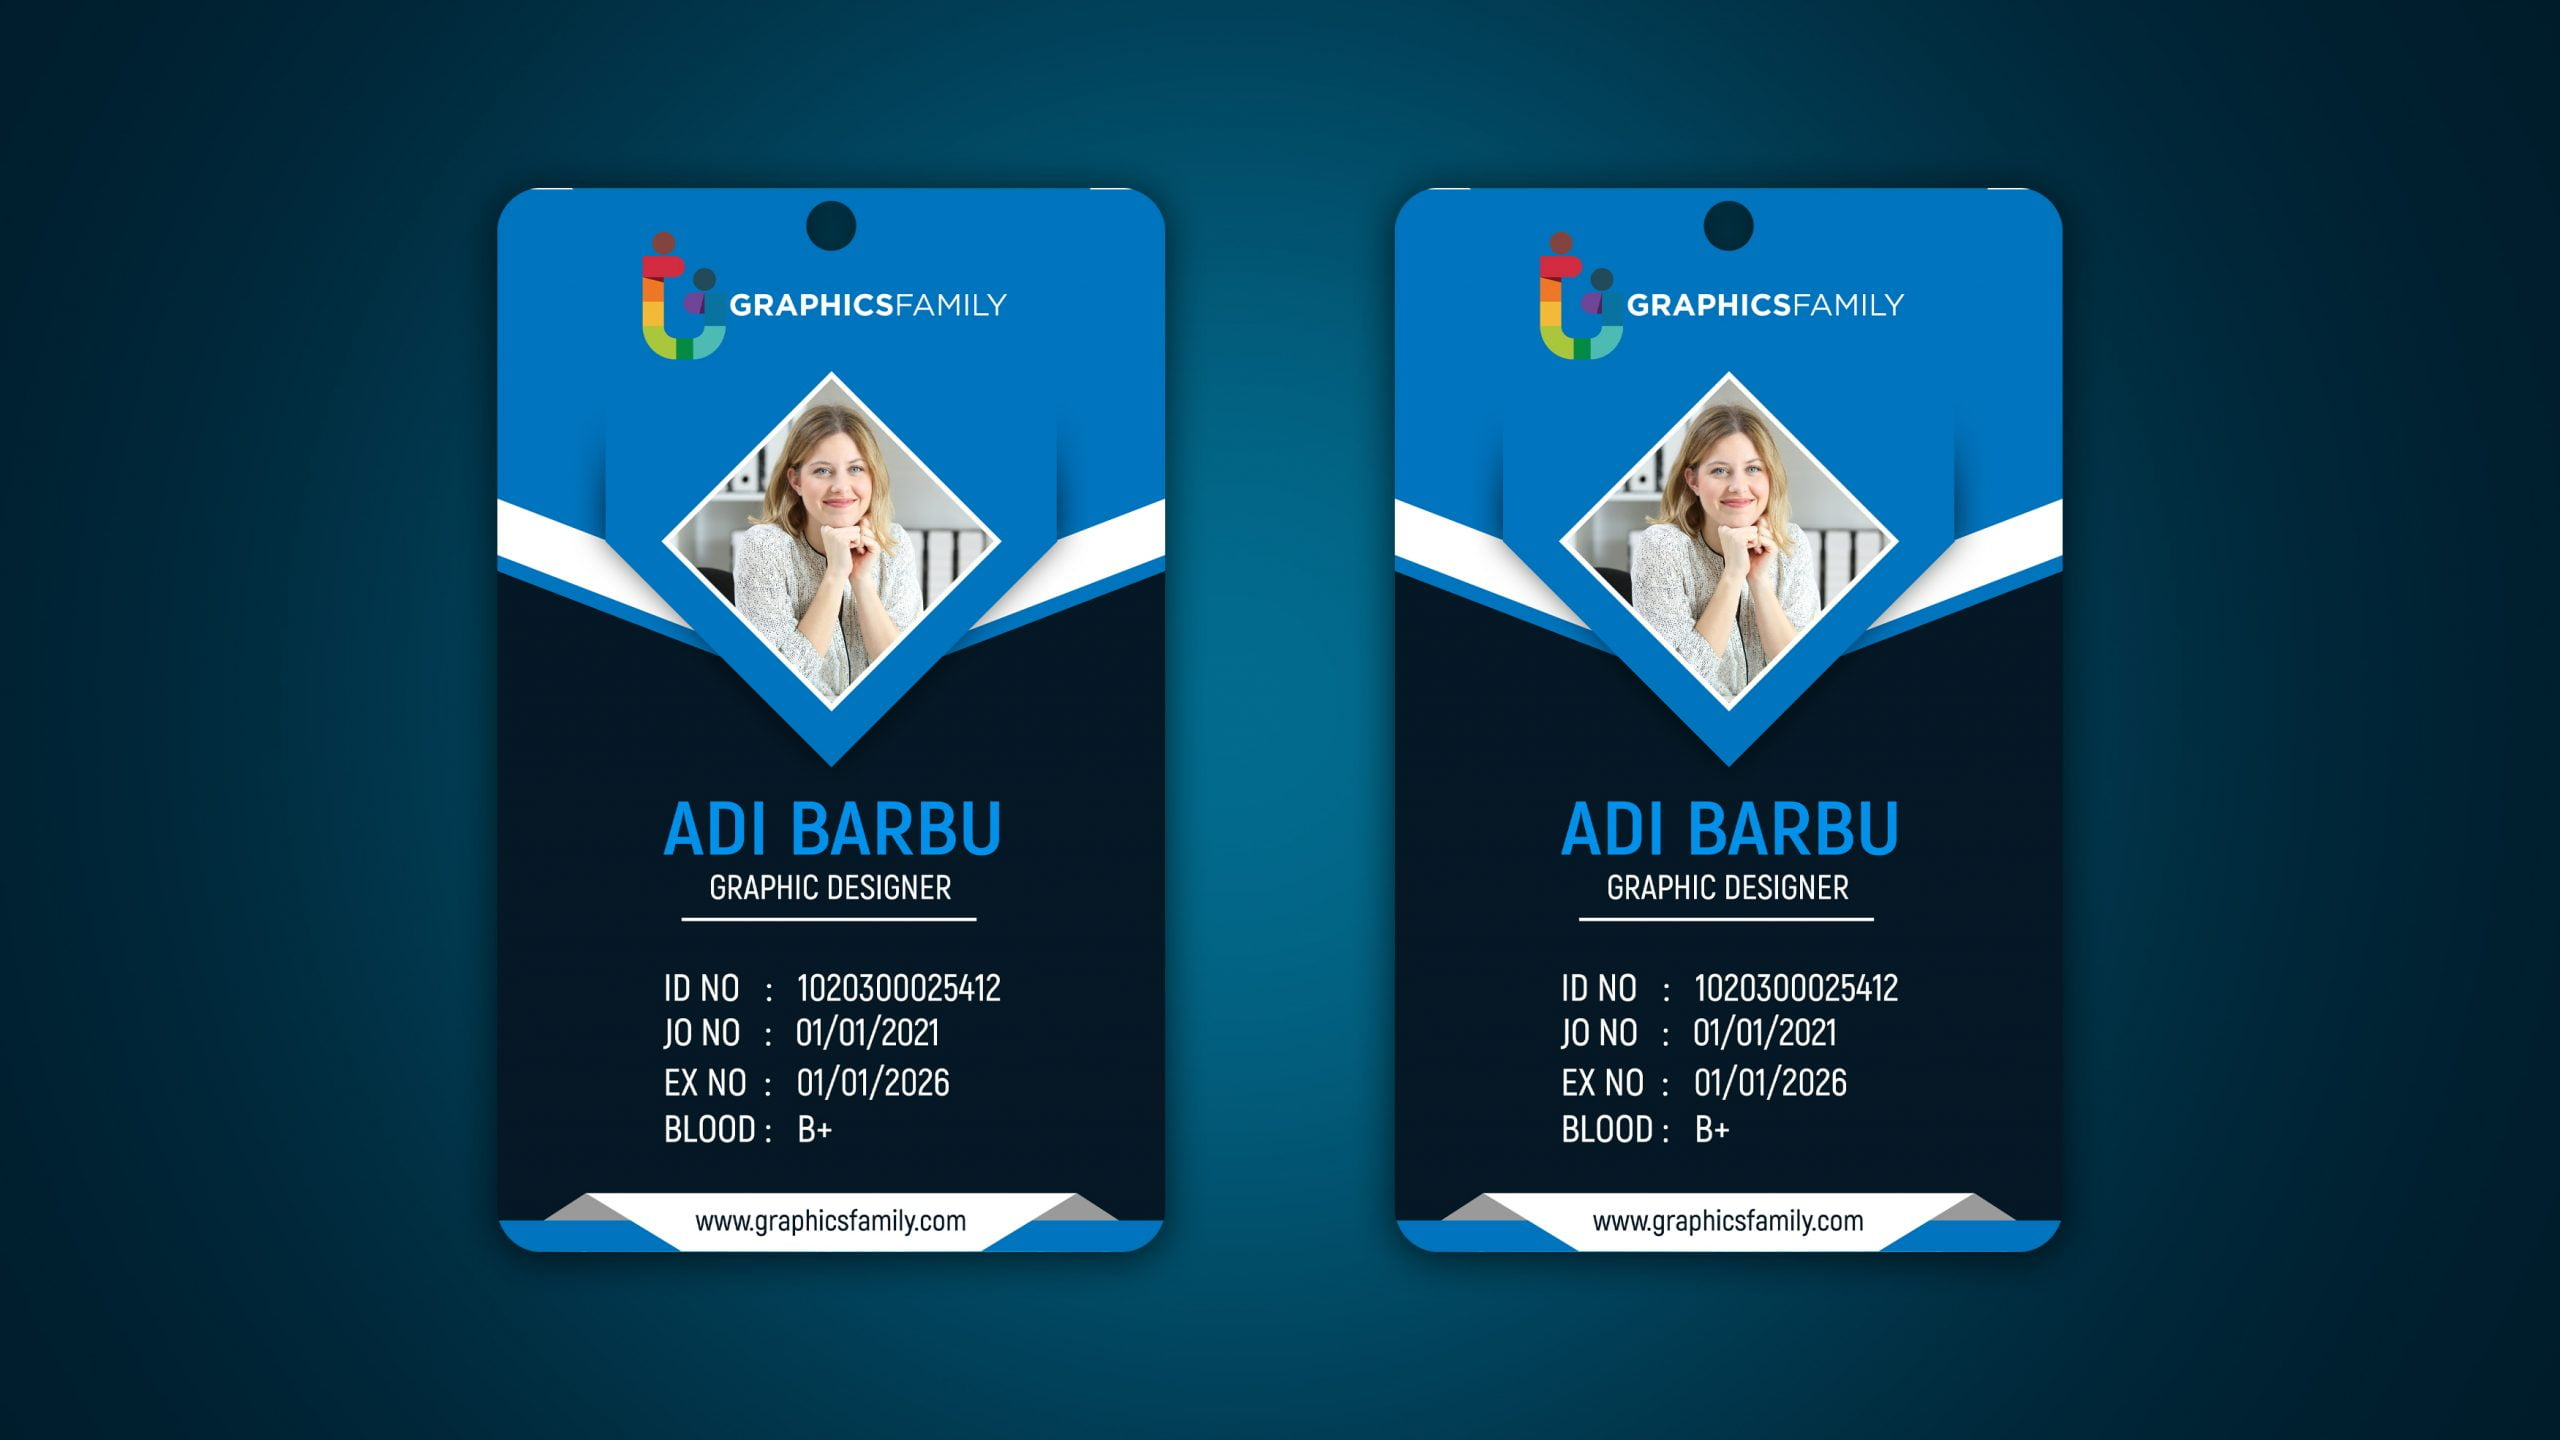 Free Corporate Id Card Design PSD Template